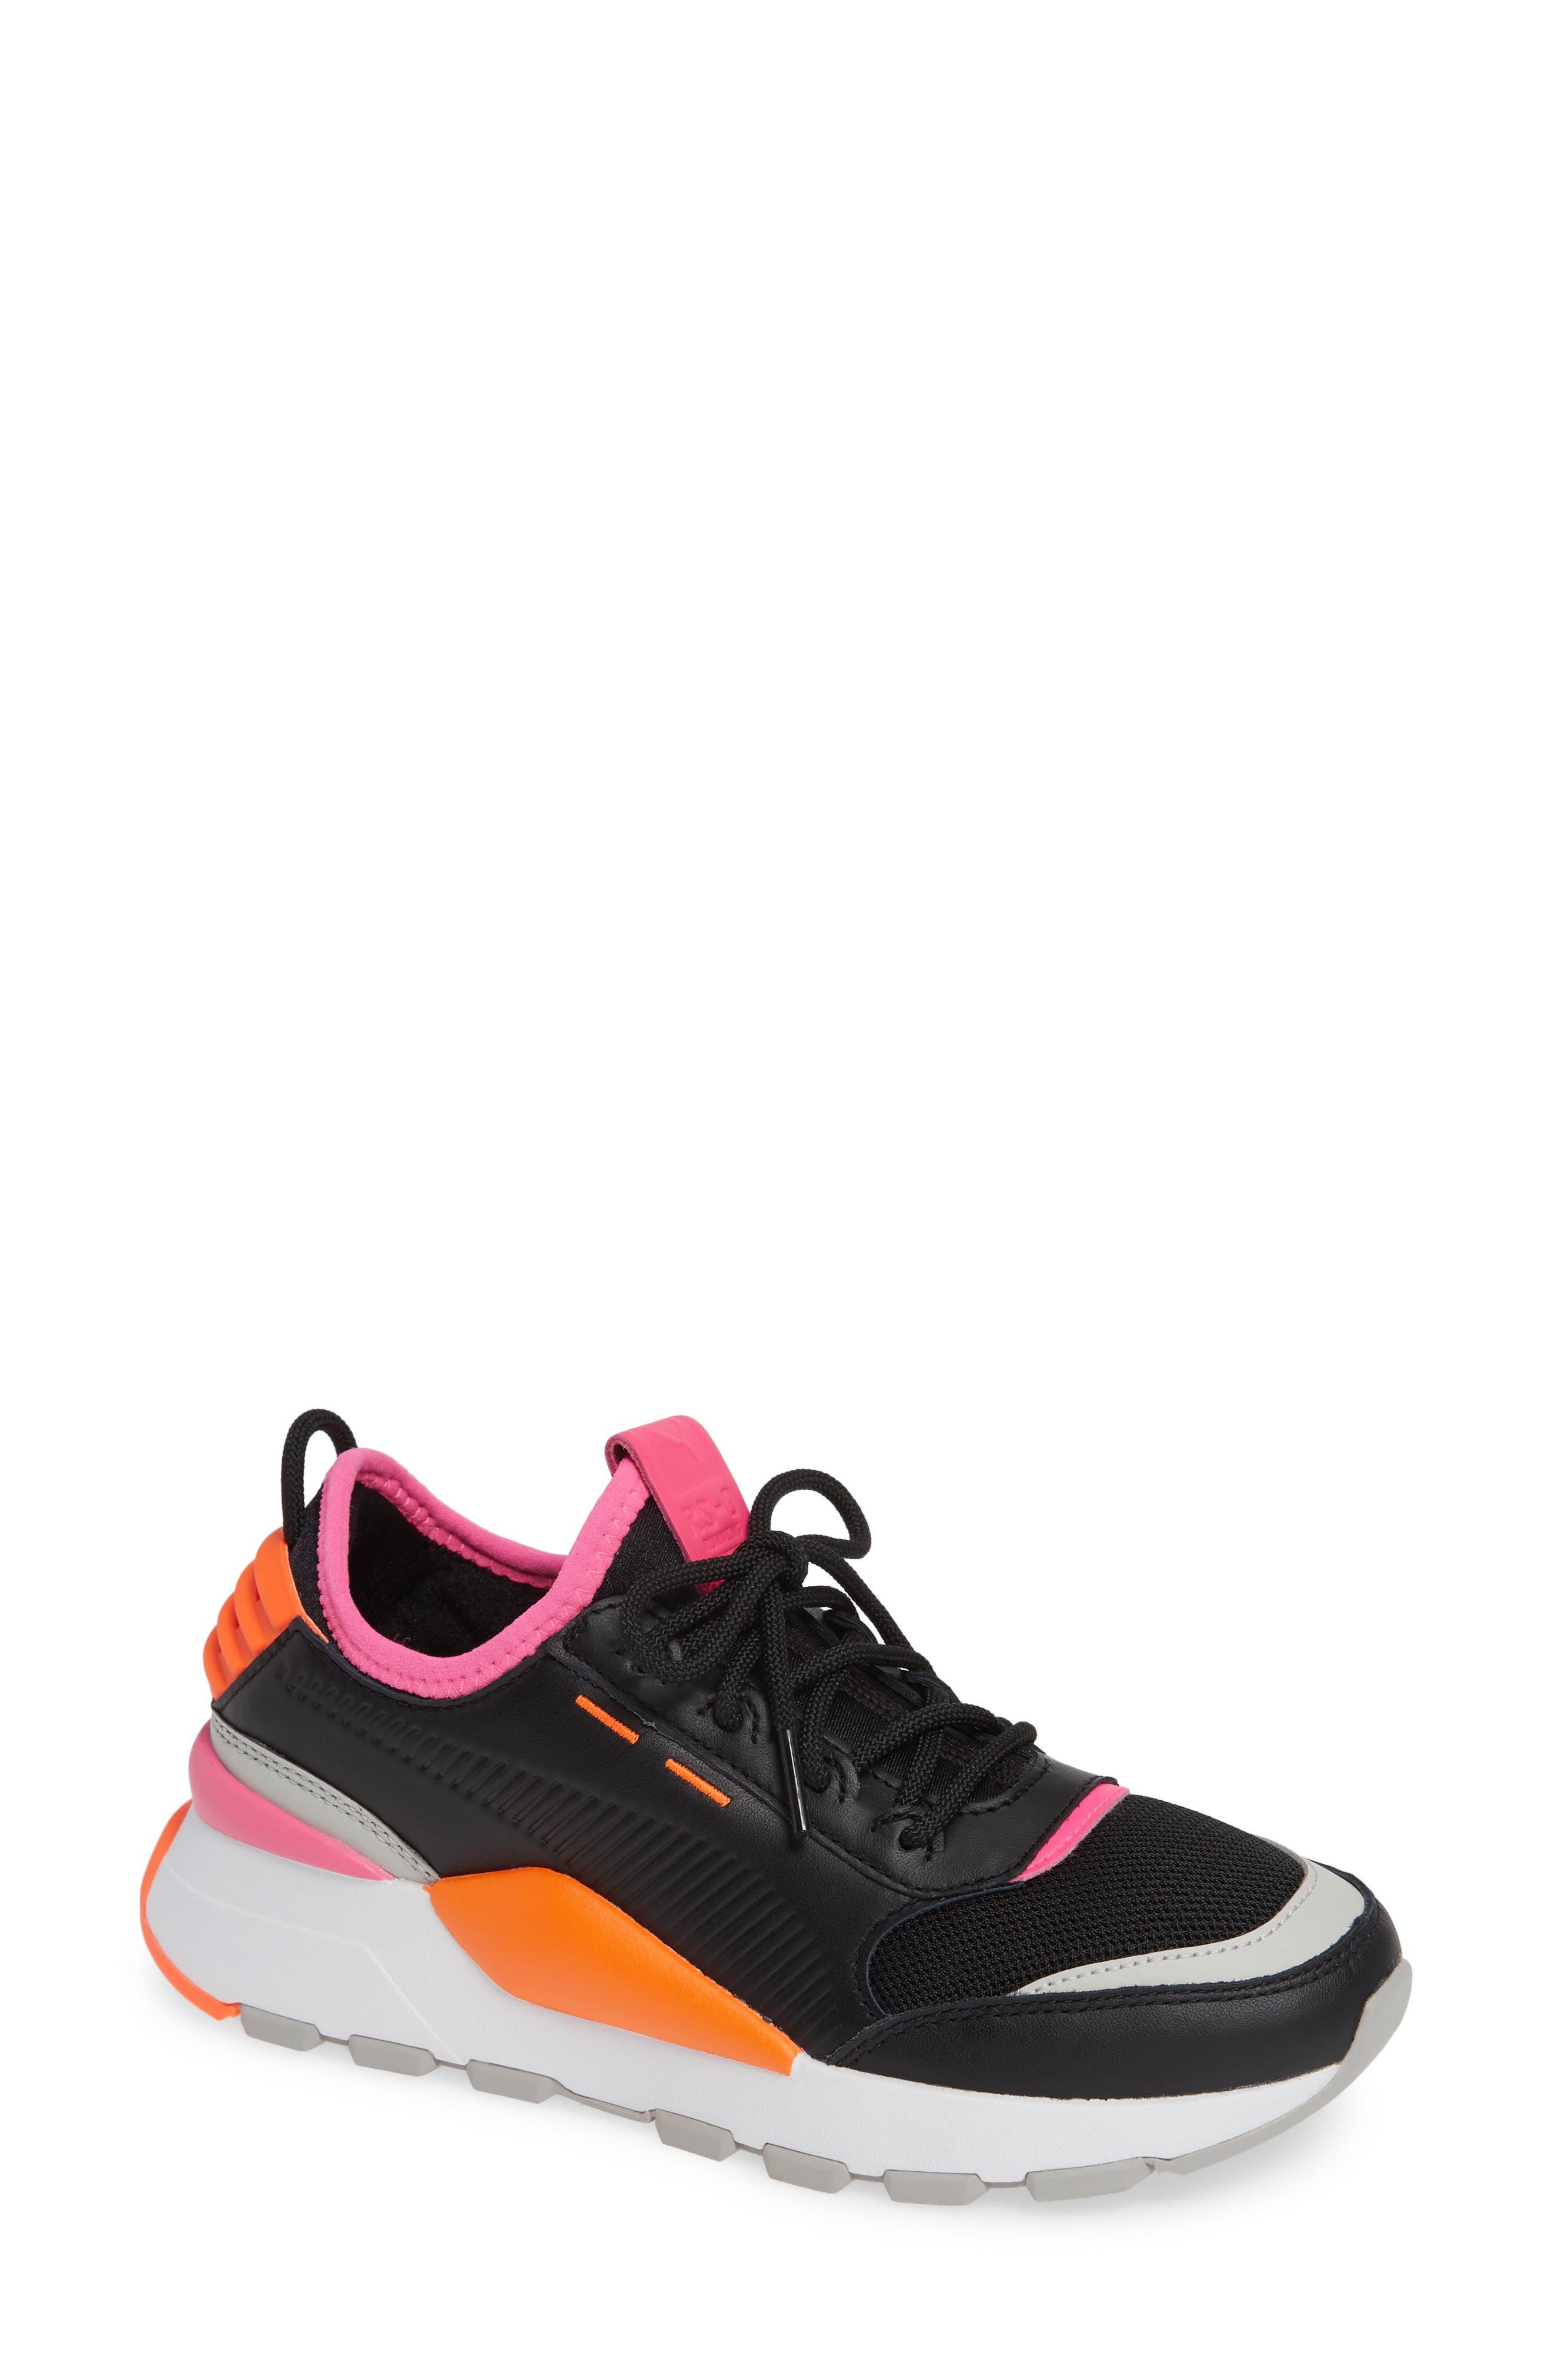 RS-0 Sneaker,                             Main thumbnail 1, color,                             001